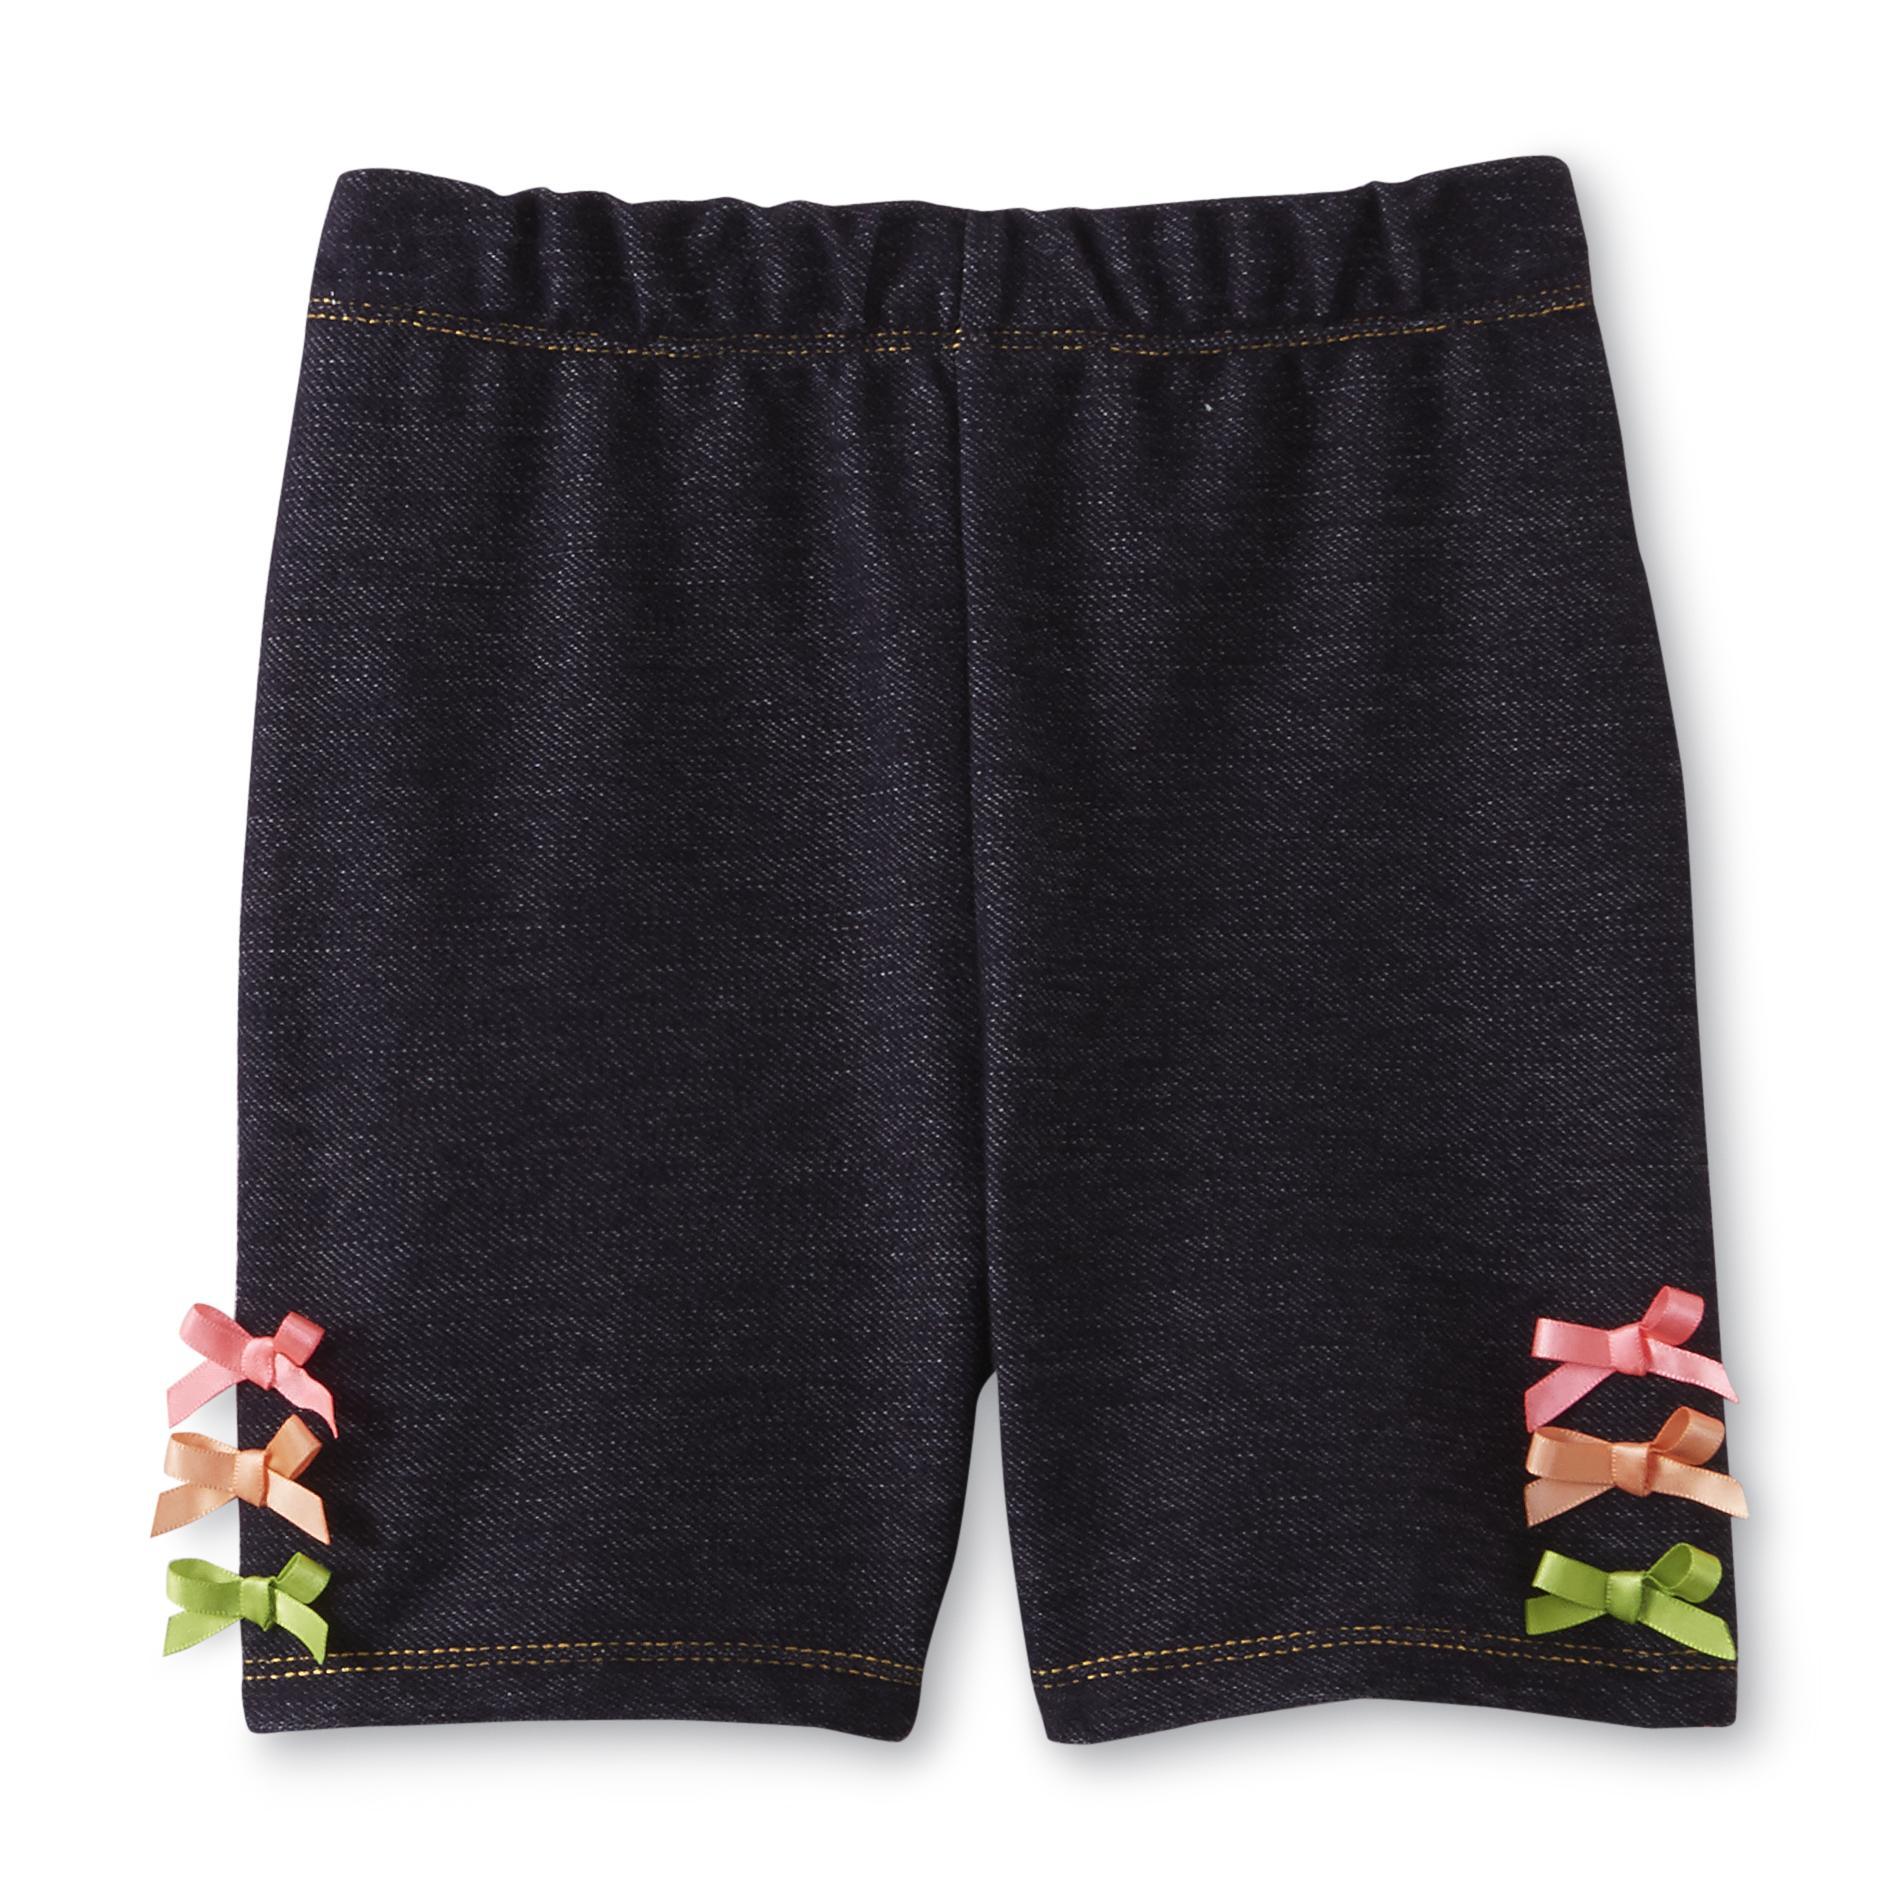 Infant & Toddler Girl's Knit Bike Shorts - Bows